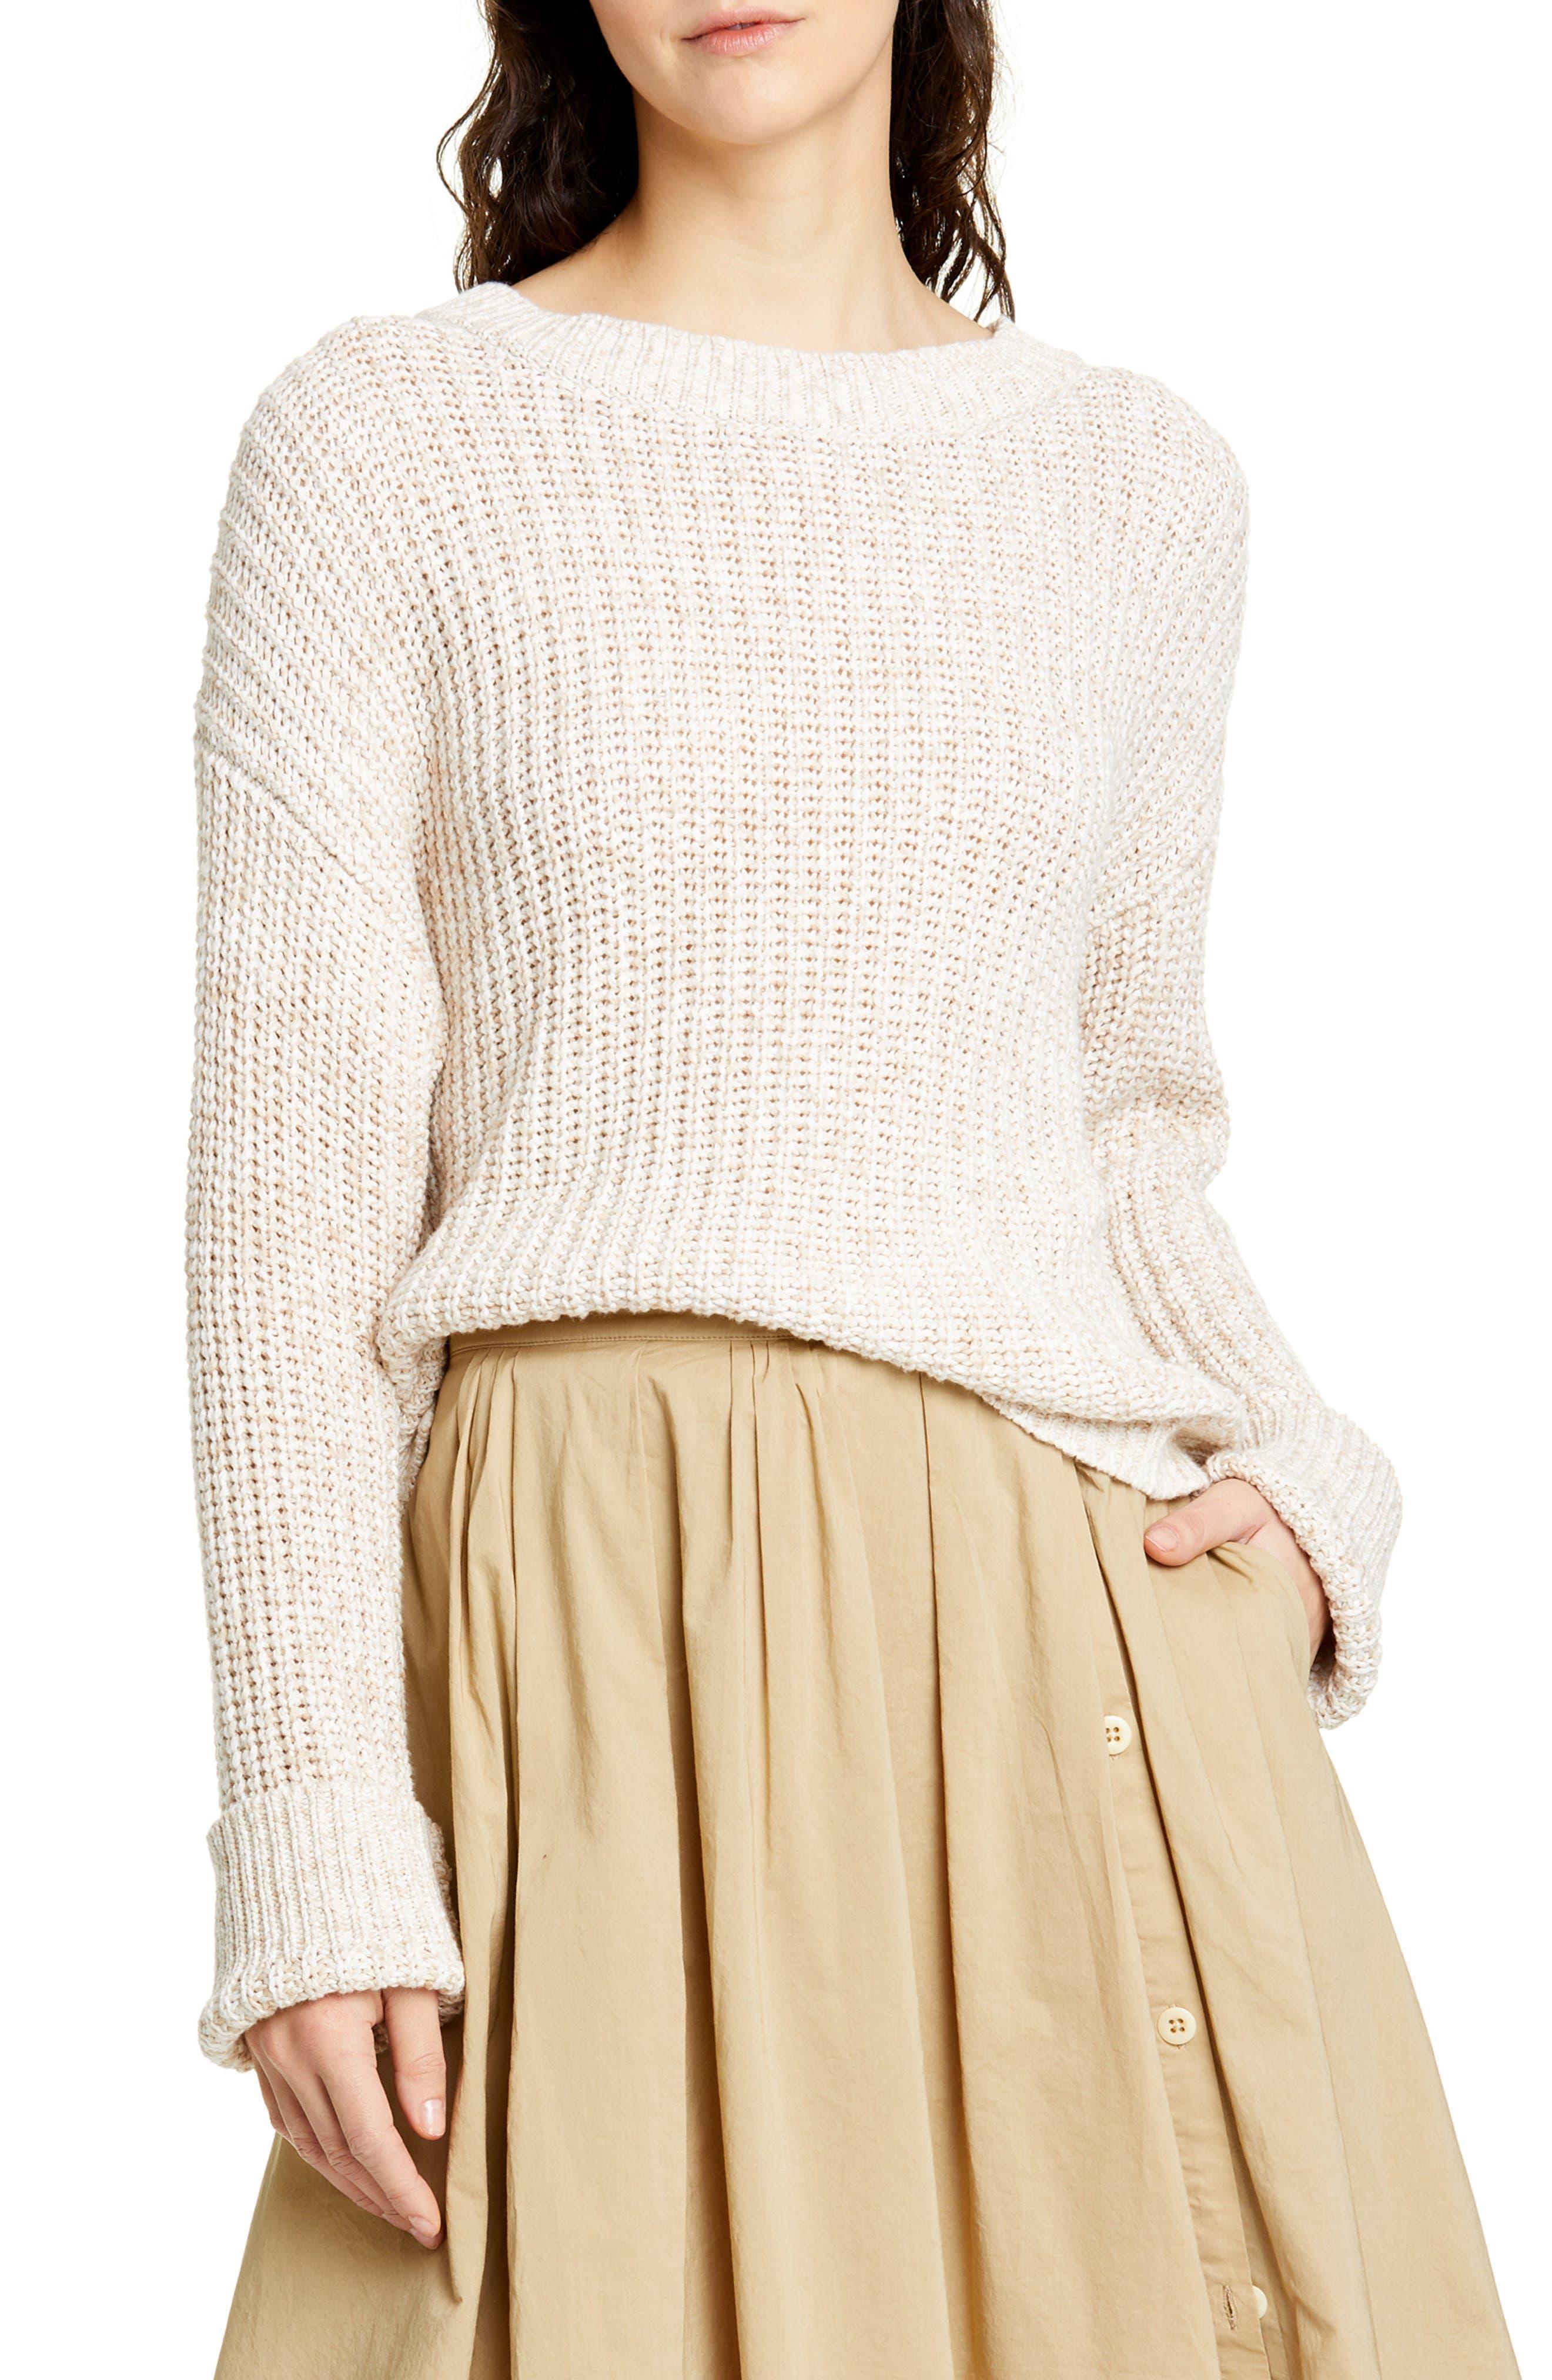 ALEX MILL, Mélange Sweater, Main thumbnail 1, color, LIGHT KHAKI